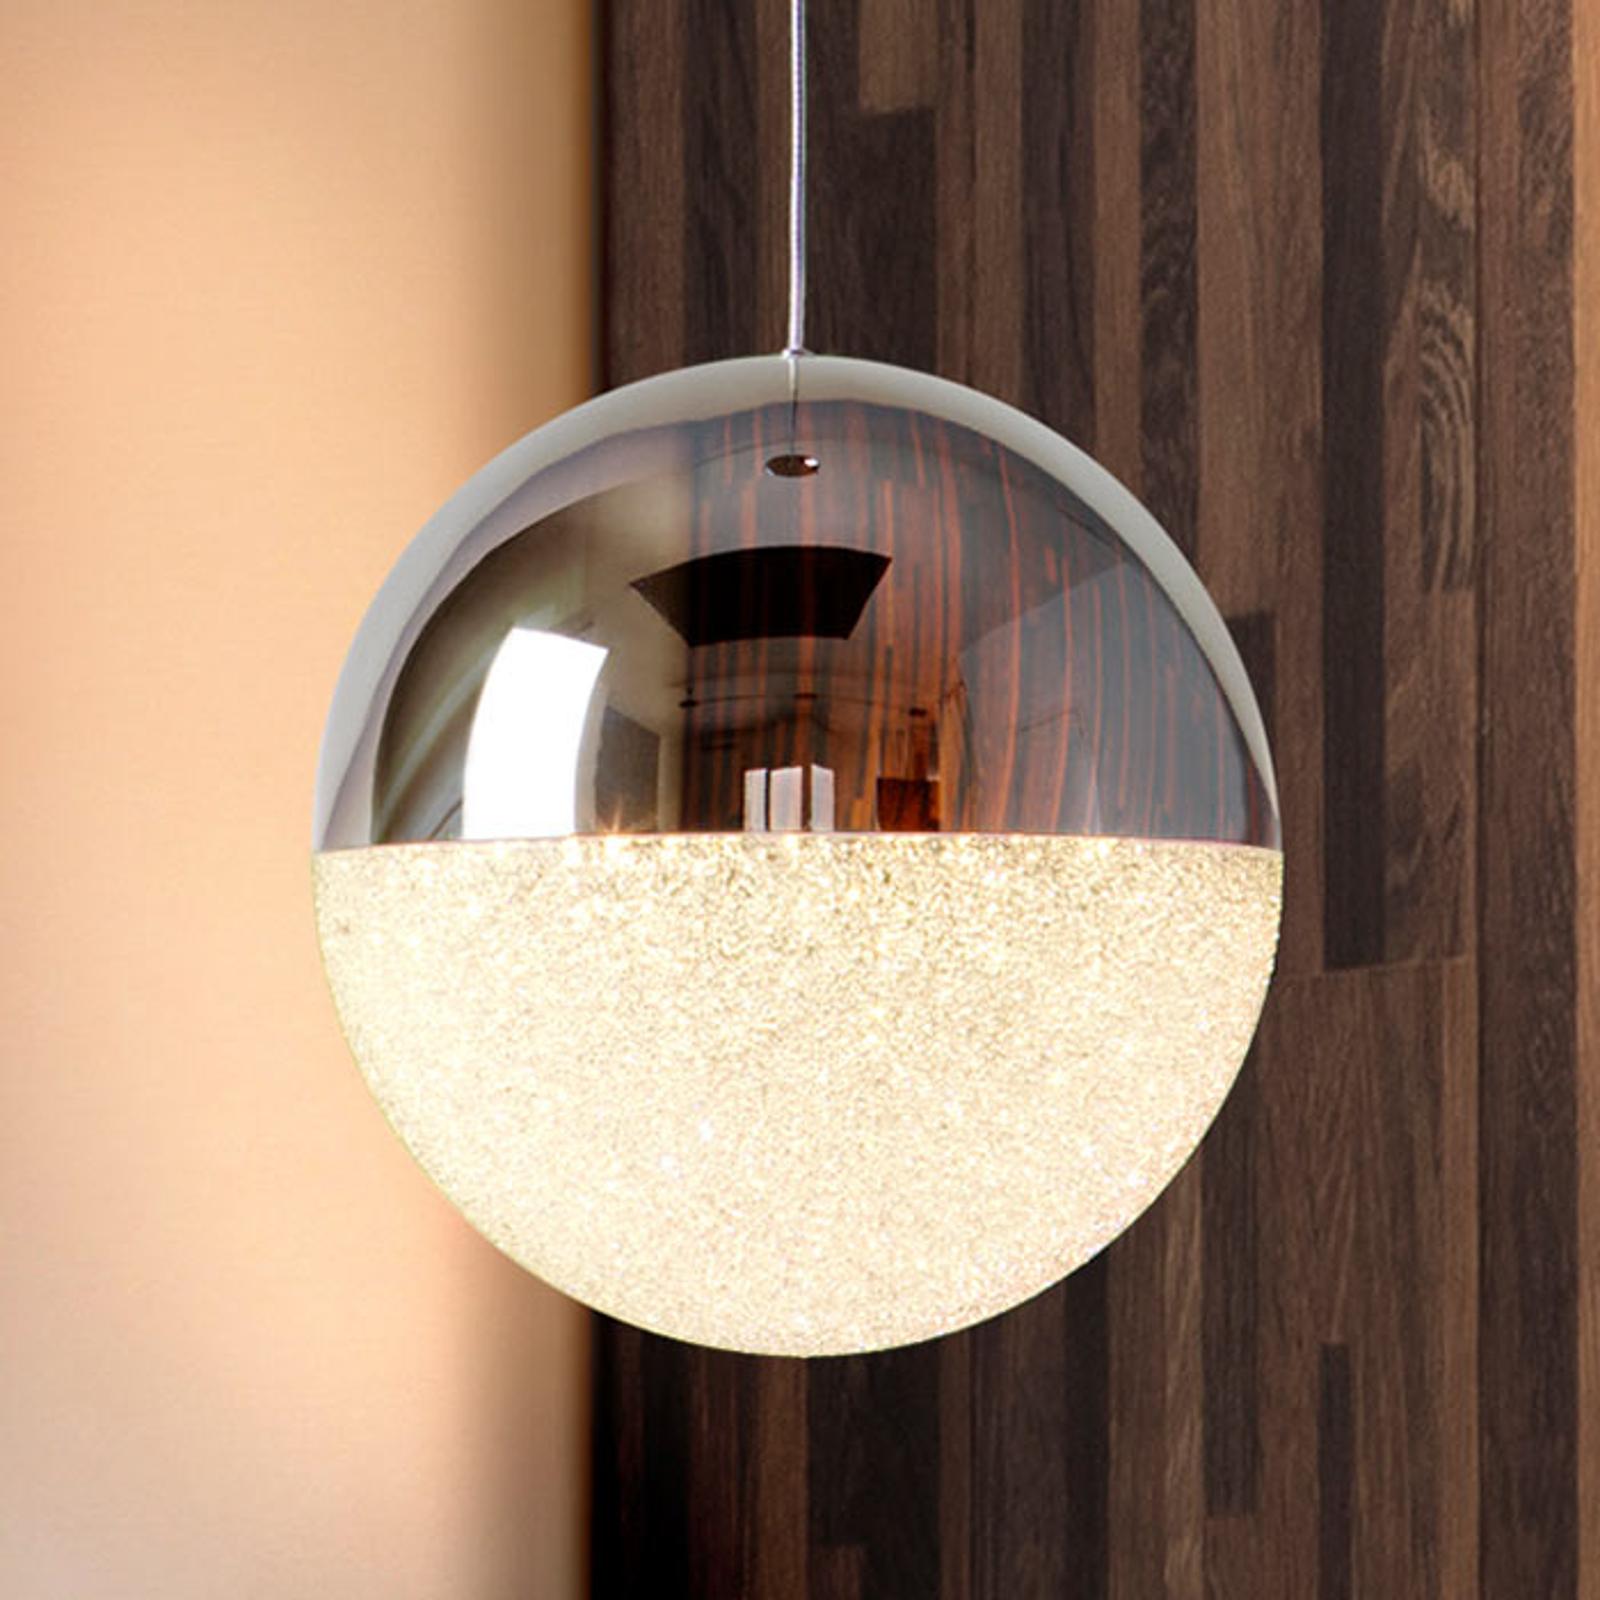 Kuleformet LED-hengelampe Sphere, Ø 20 cm